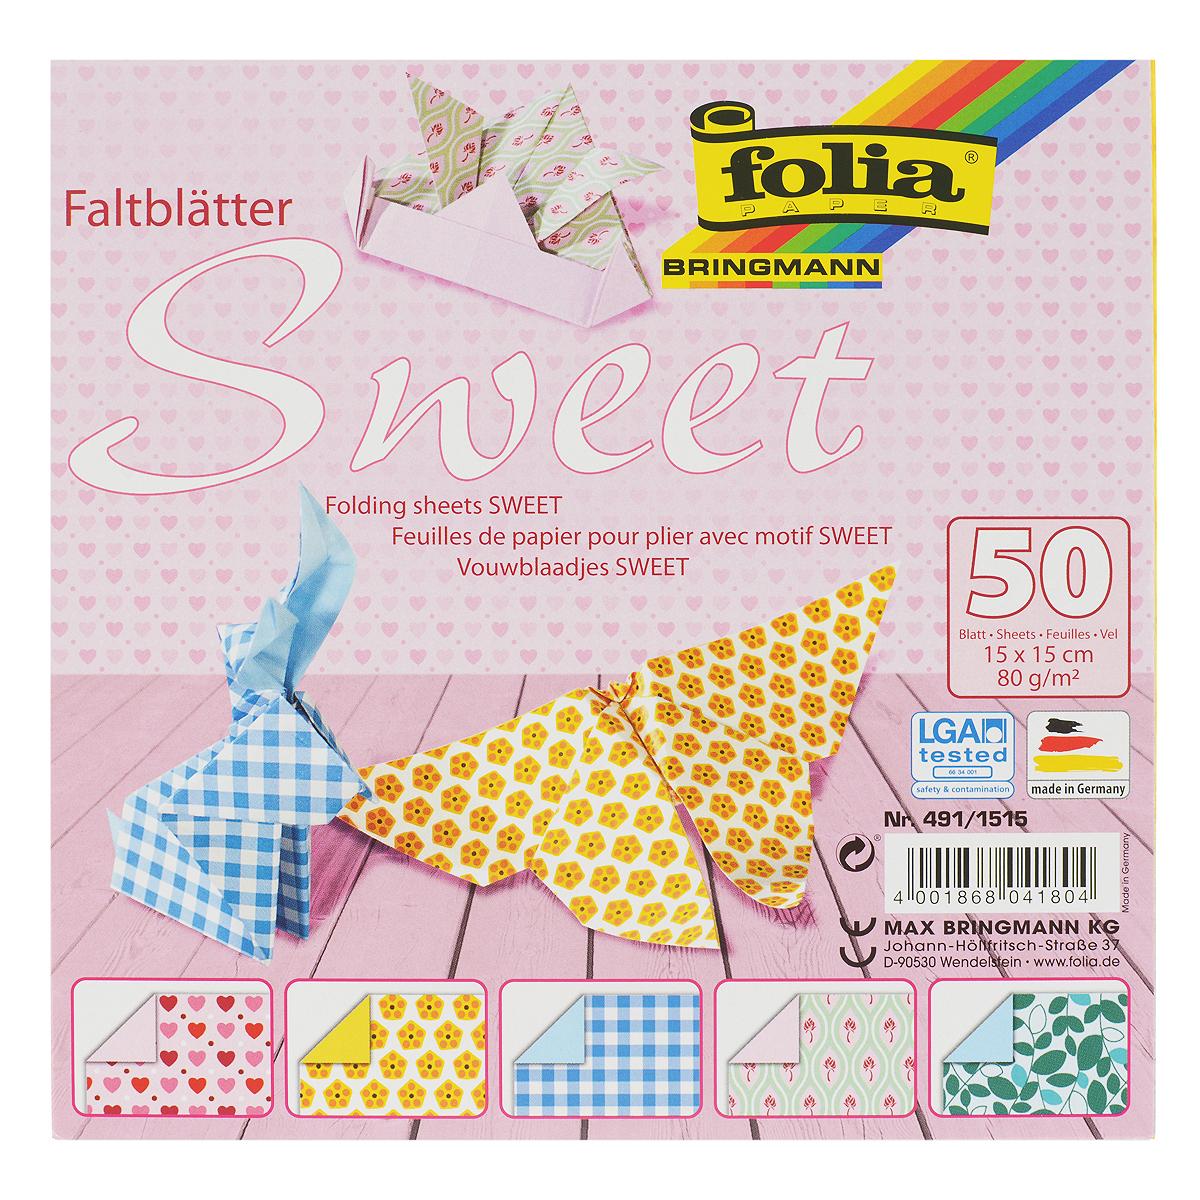 Бумага для оригами Folia Sweet, 15 см х 15 см, 50 листов бумага папиросная folia 50 см х 70 см 10 листов 7708130